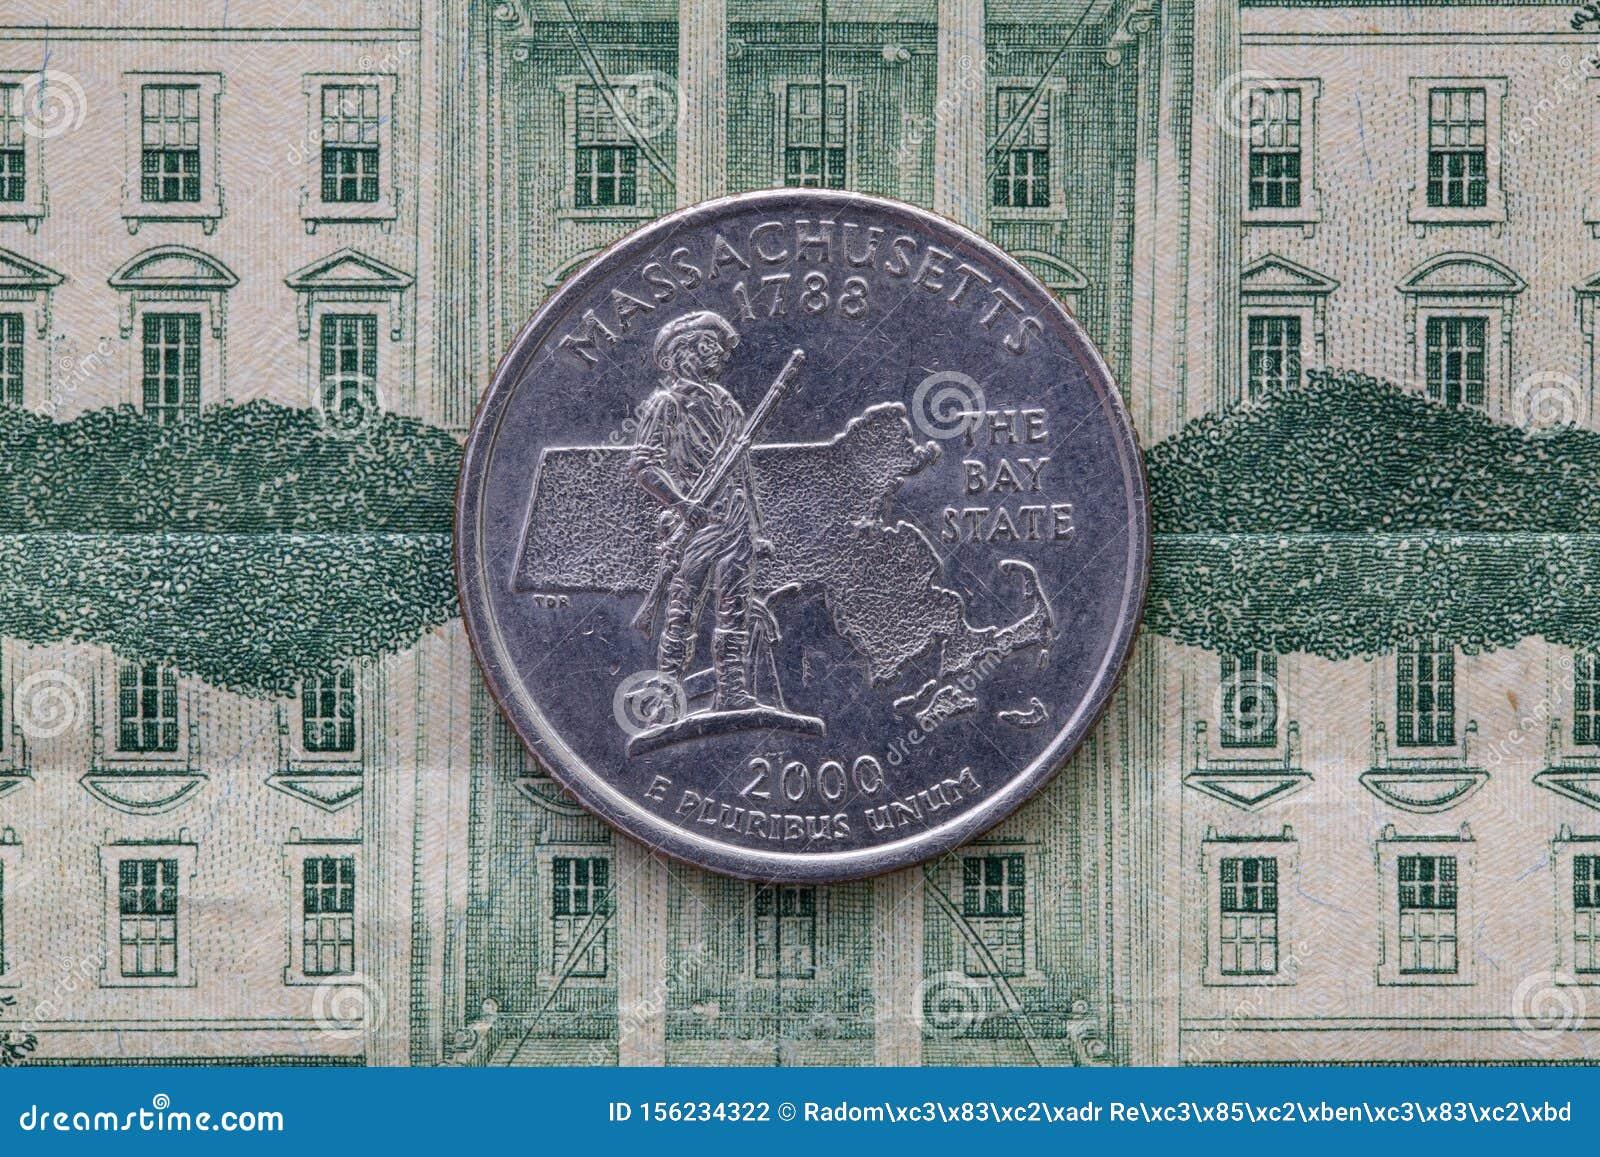 Symmetric composition of US dollar bills and a quarter of Massachusetts